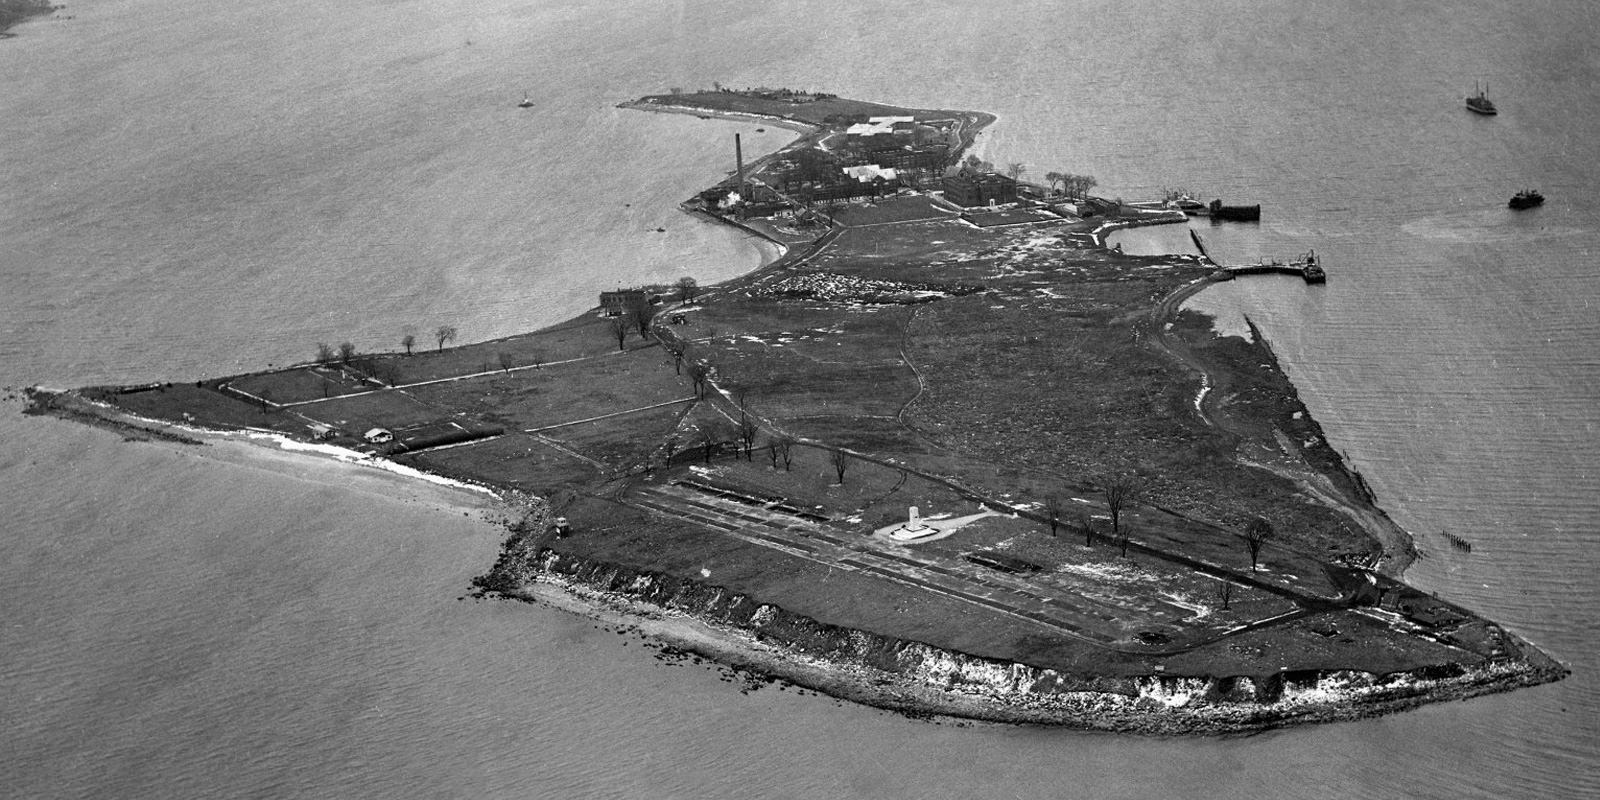 Hart Island An Abandoned Hospital Atop A Mass Grave Site